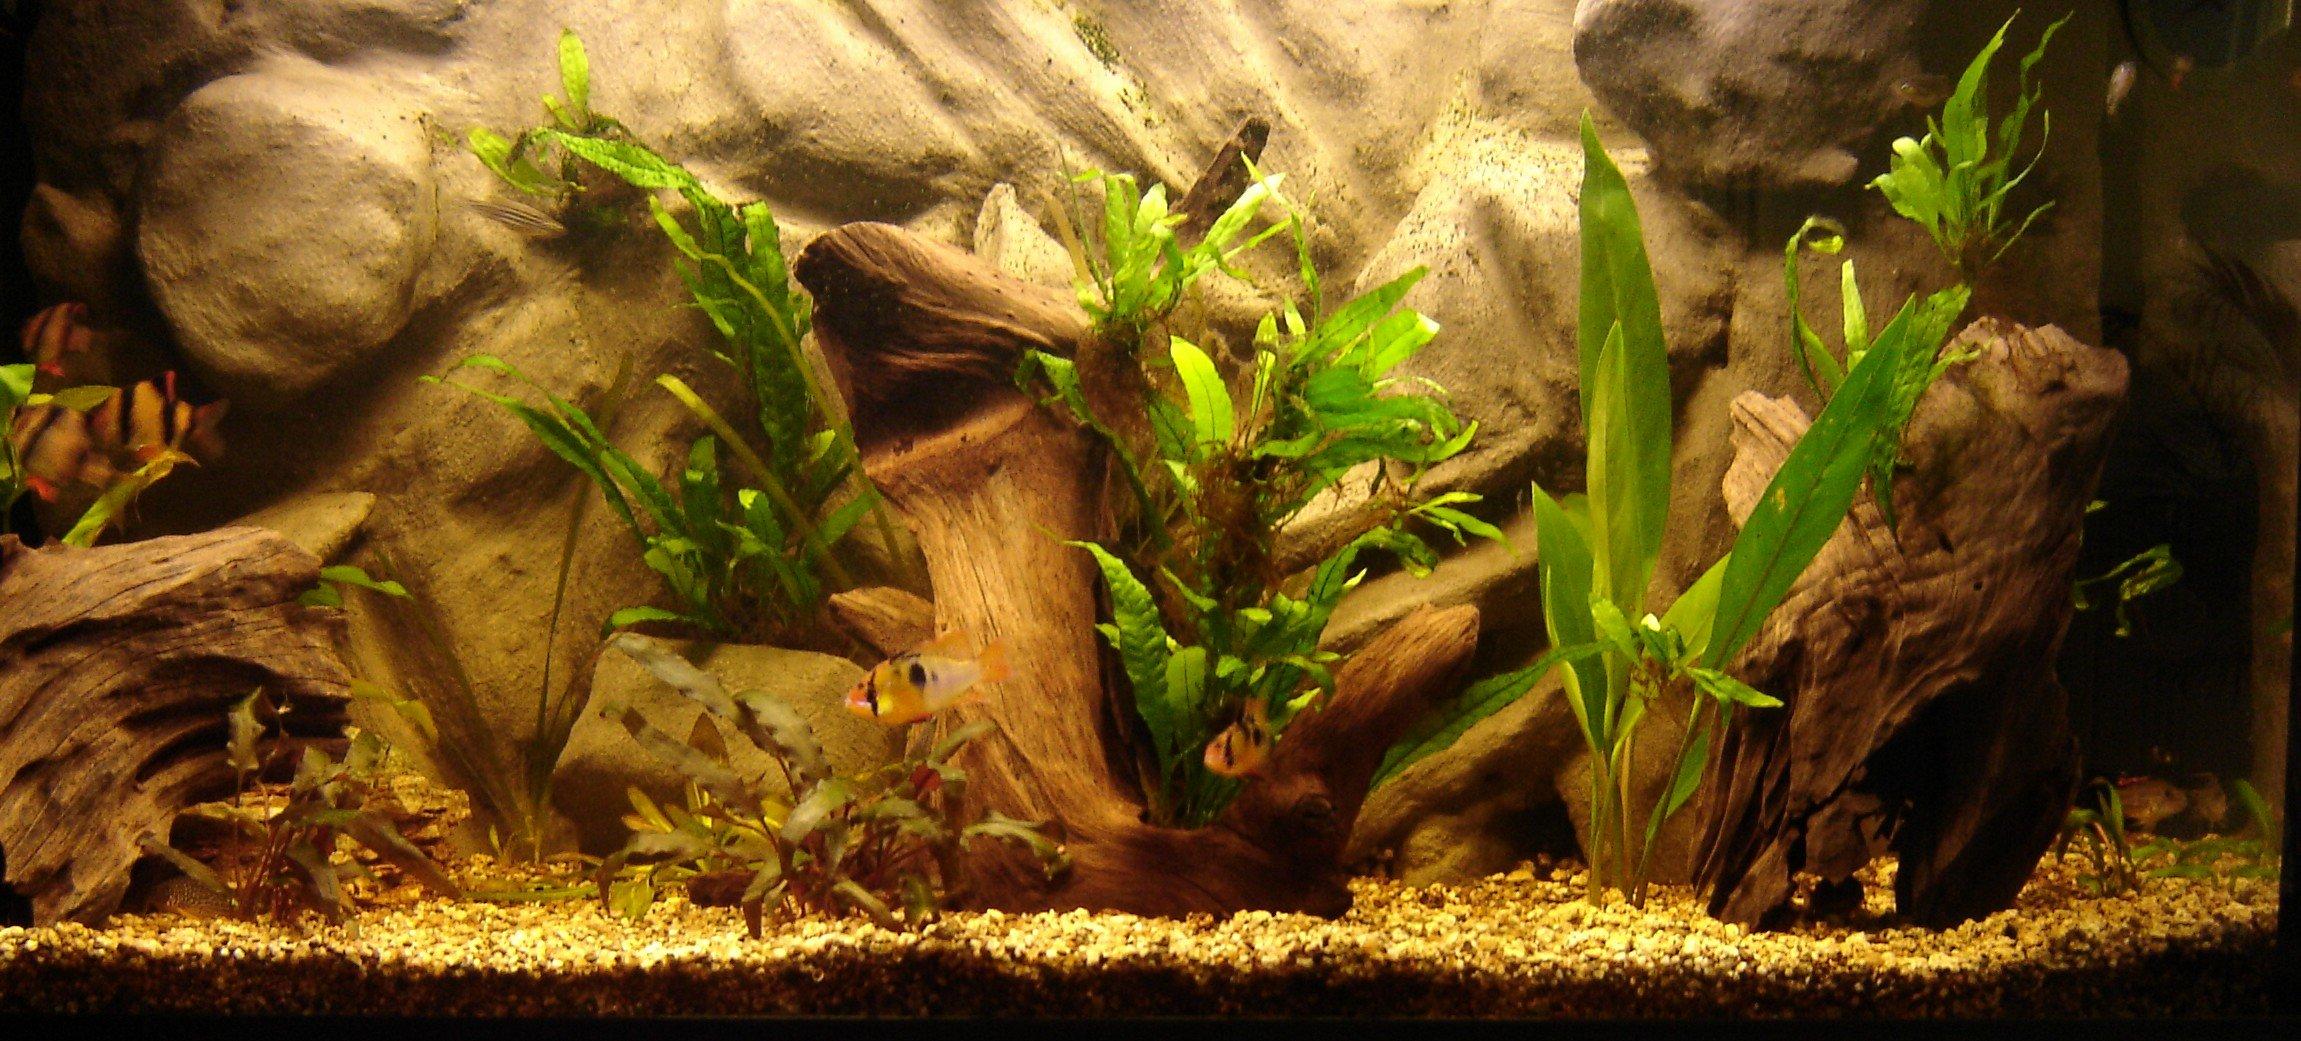 Cool Fish Tank Backgrounds Beautiful Cool Fish Backgrounds Wallpapersafari